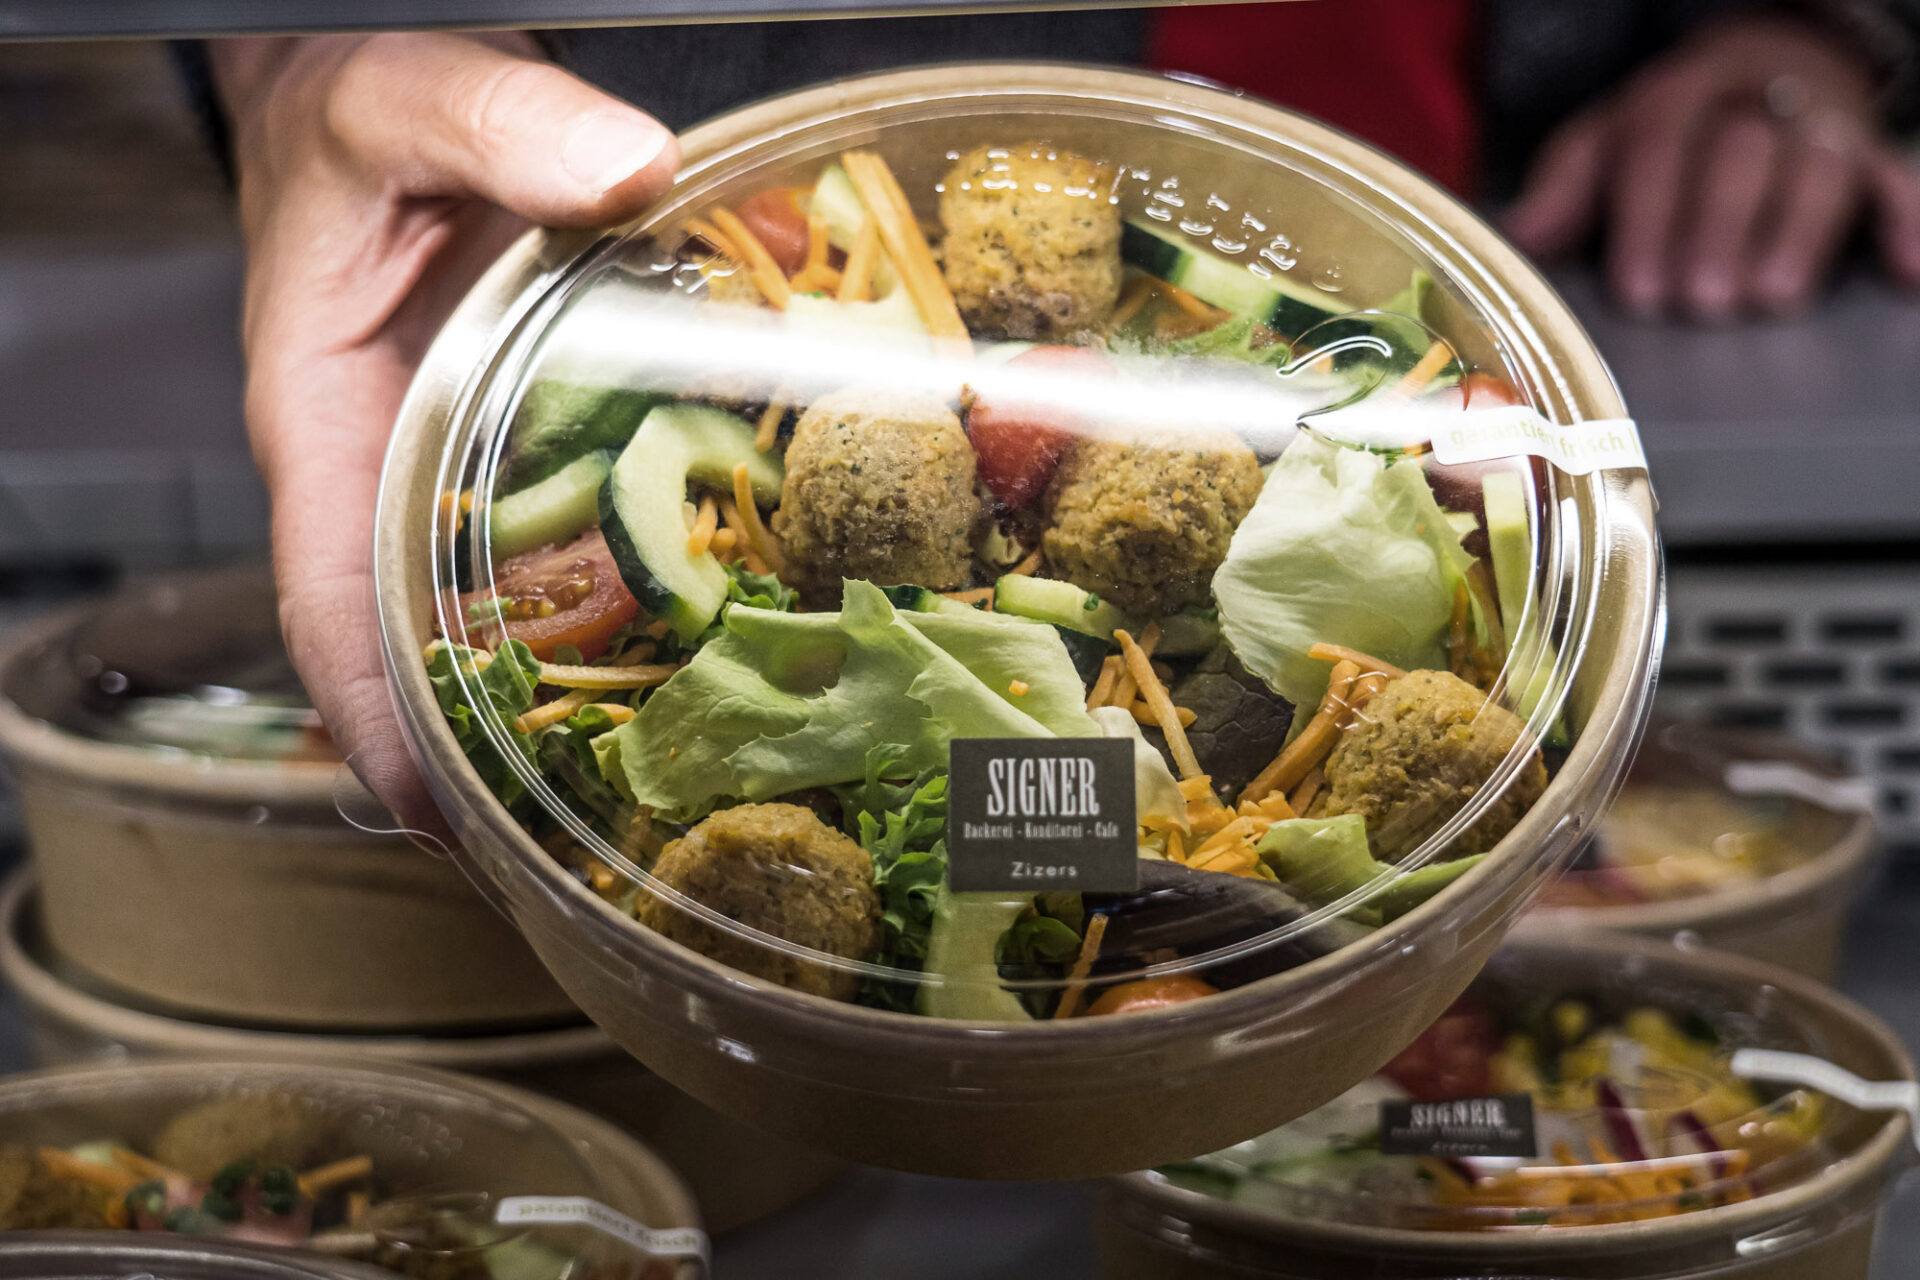 Salat Bäckerei Signer